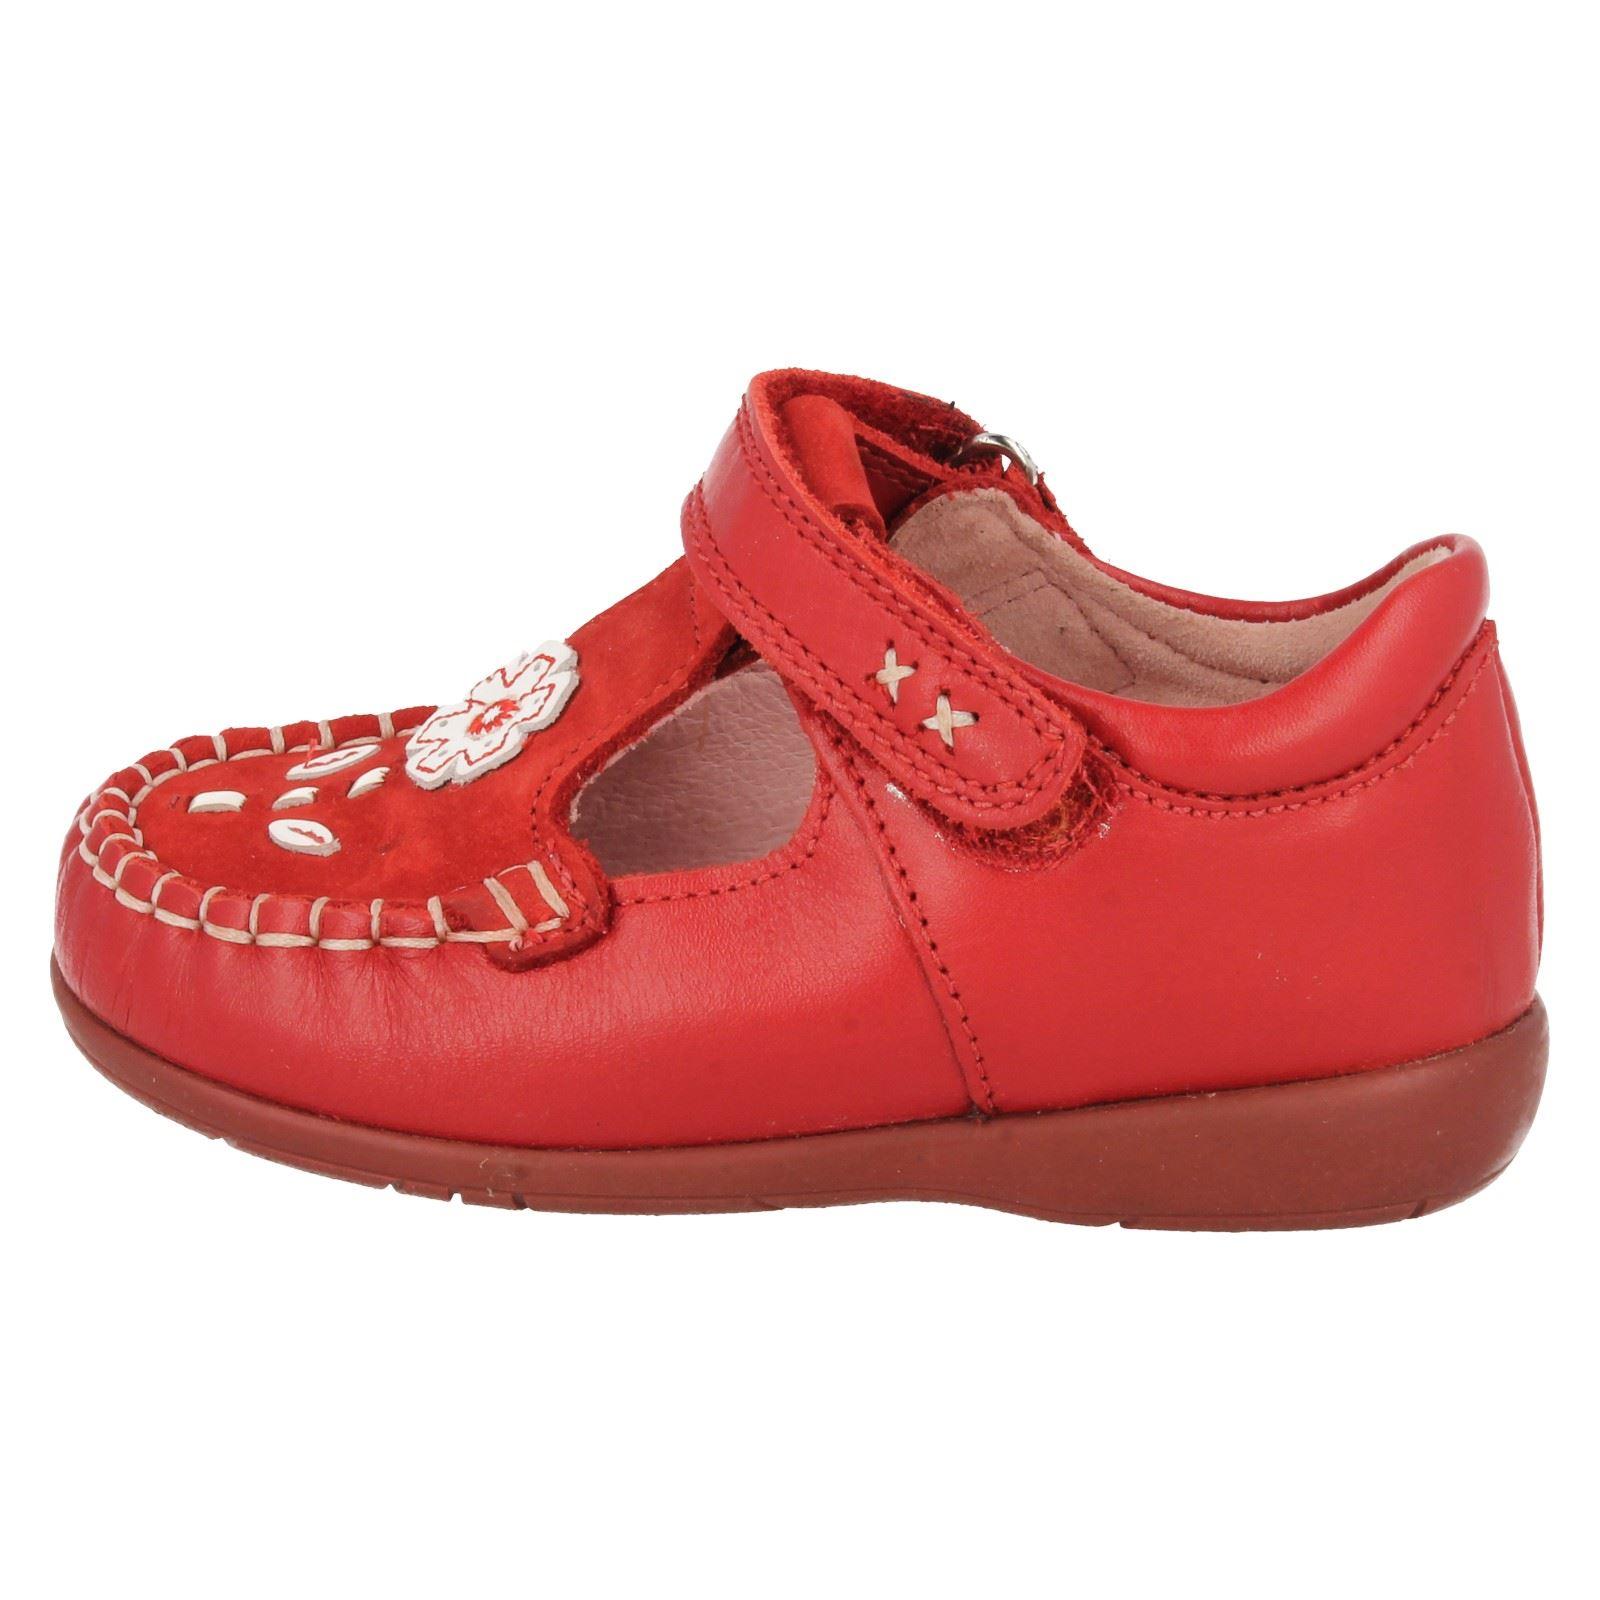 Girls Startrite T-Bar Smart Casual Shoes Leila